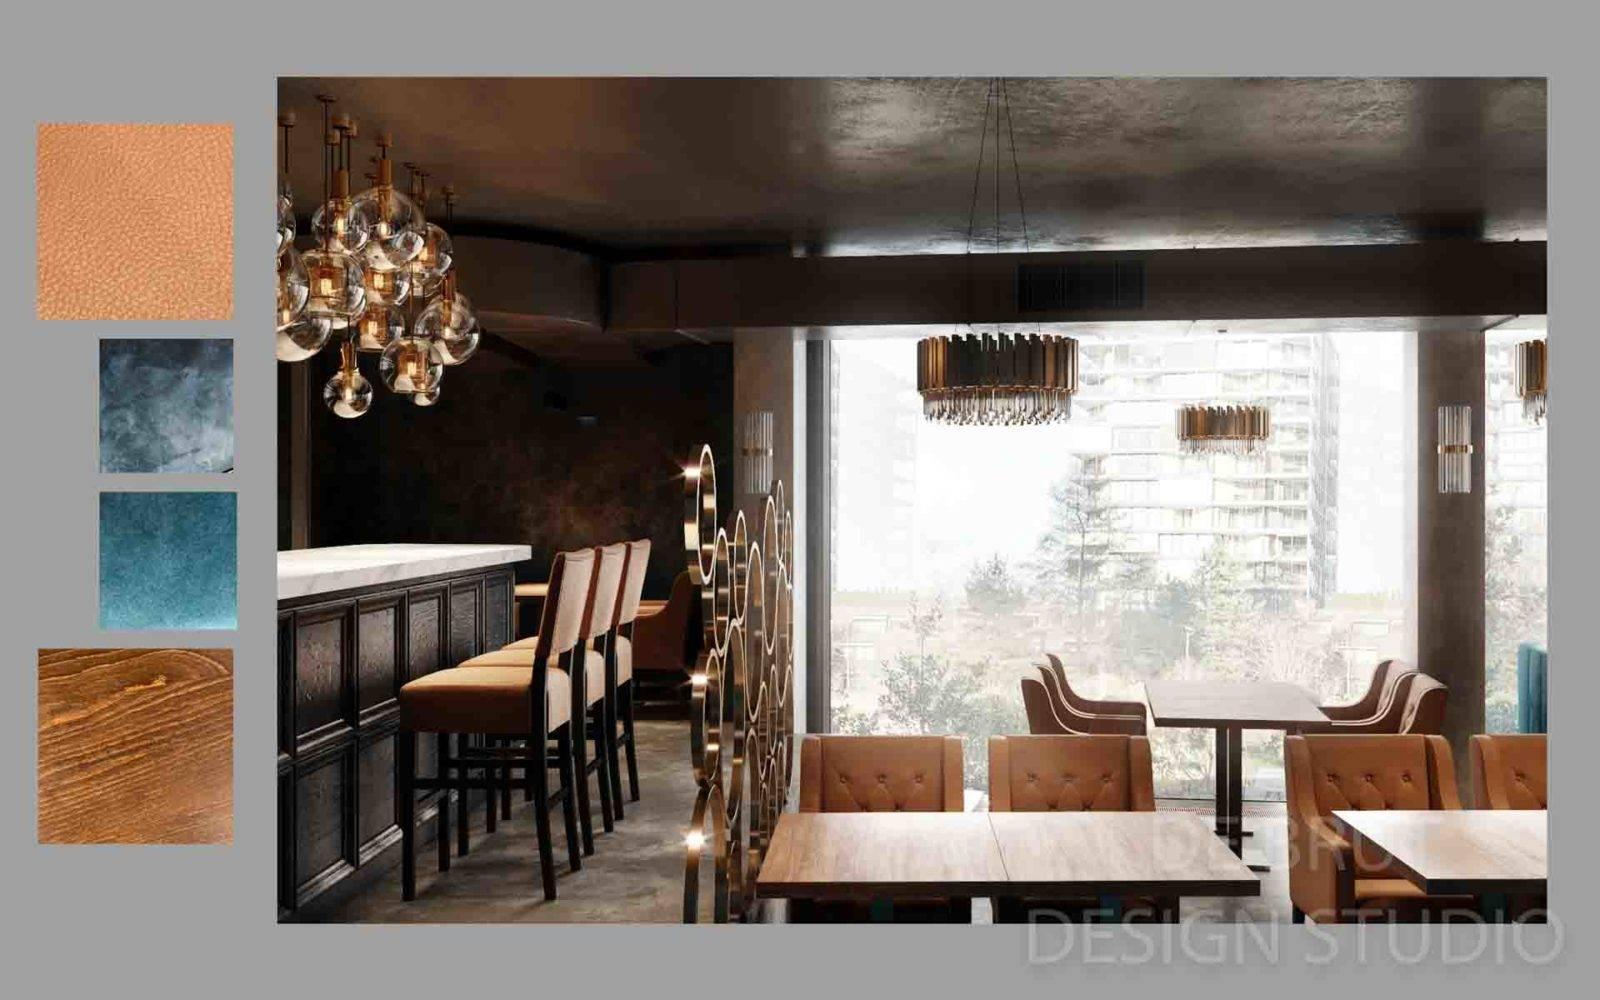 design interieru praha alex brut studio richman bussines bar 8 1 - Design interiéru restaurace Richman